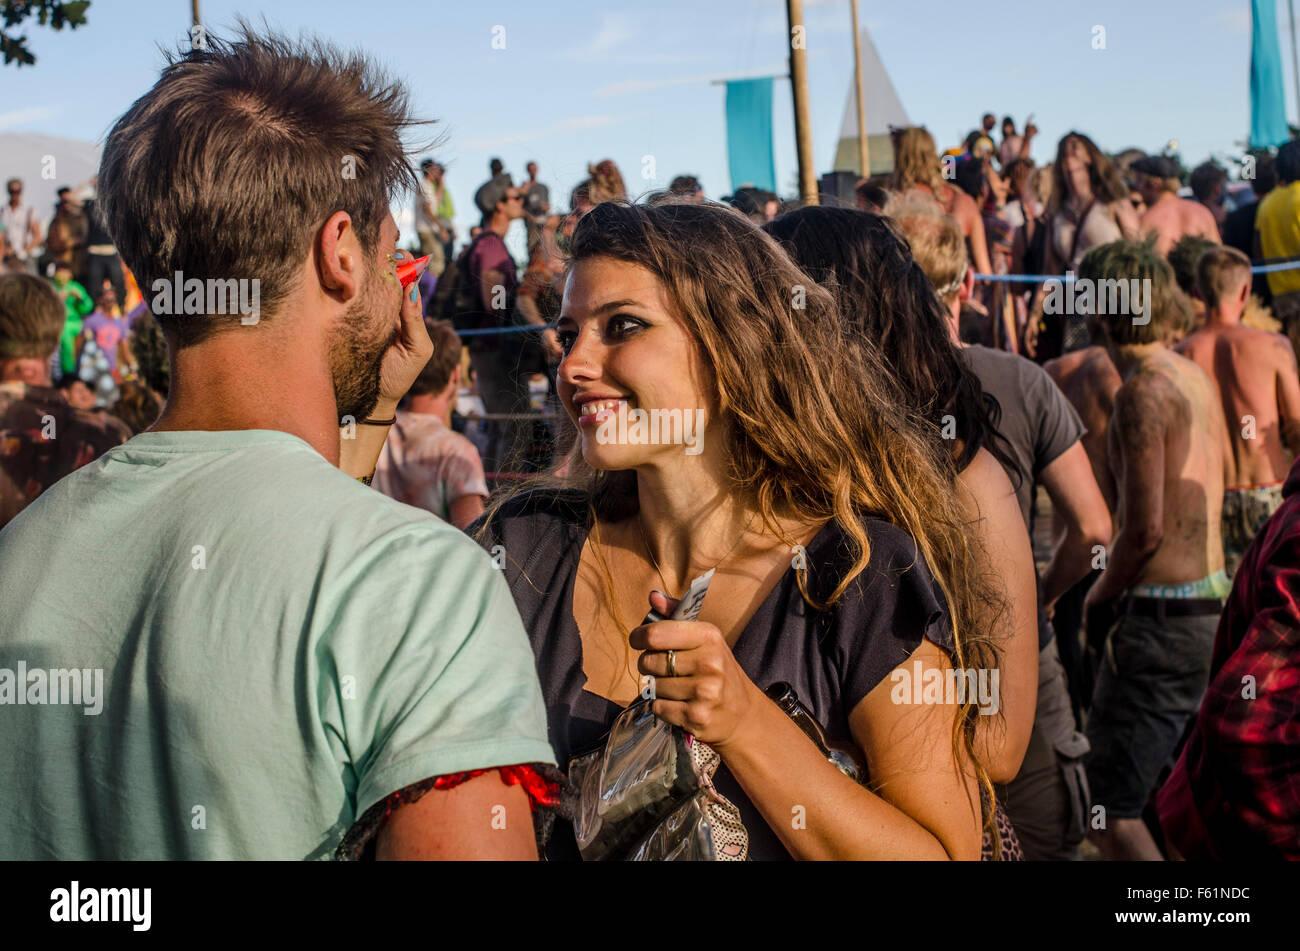 Single party lahr 2013 bilder